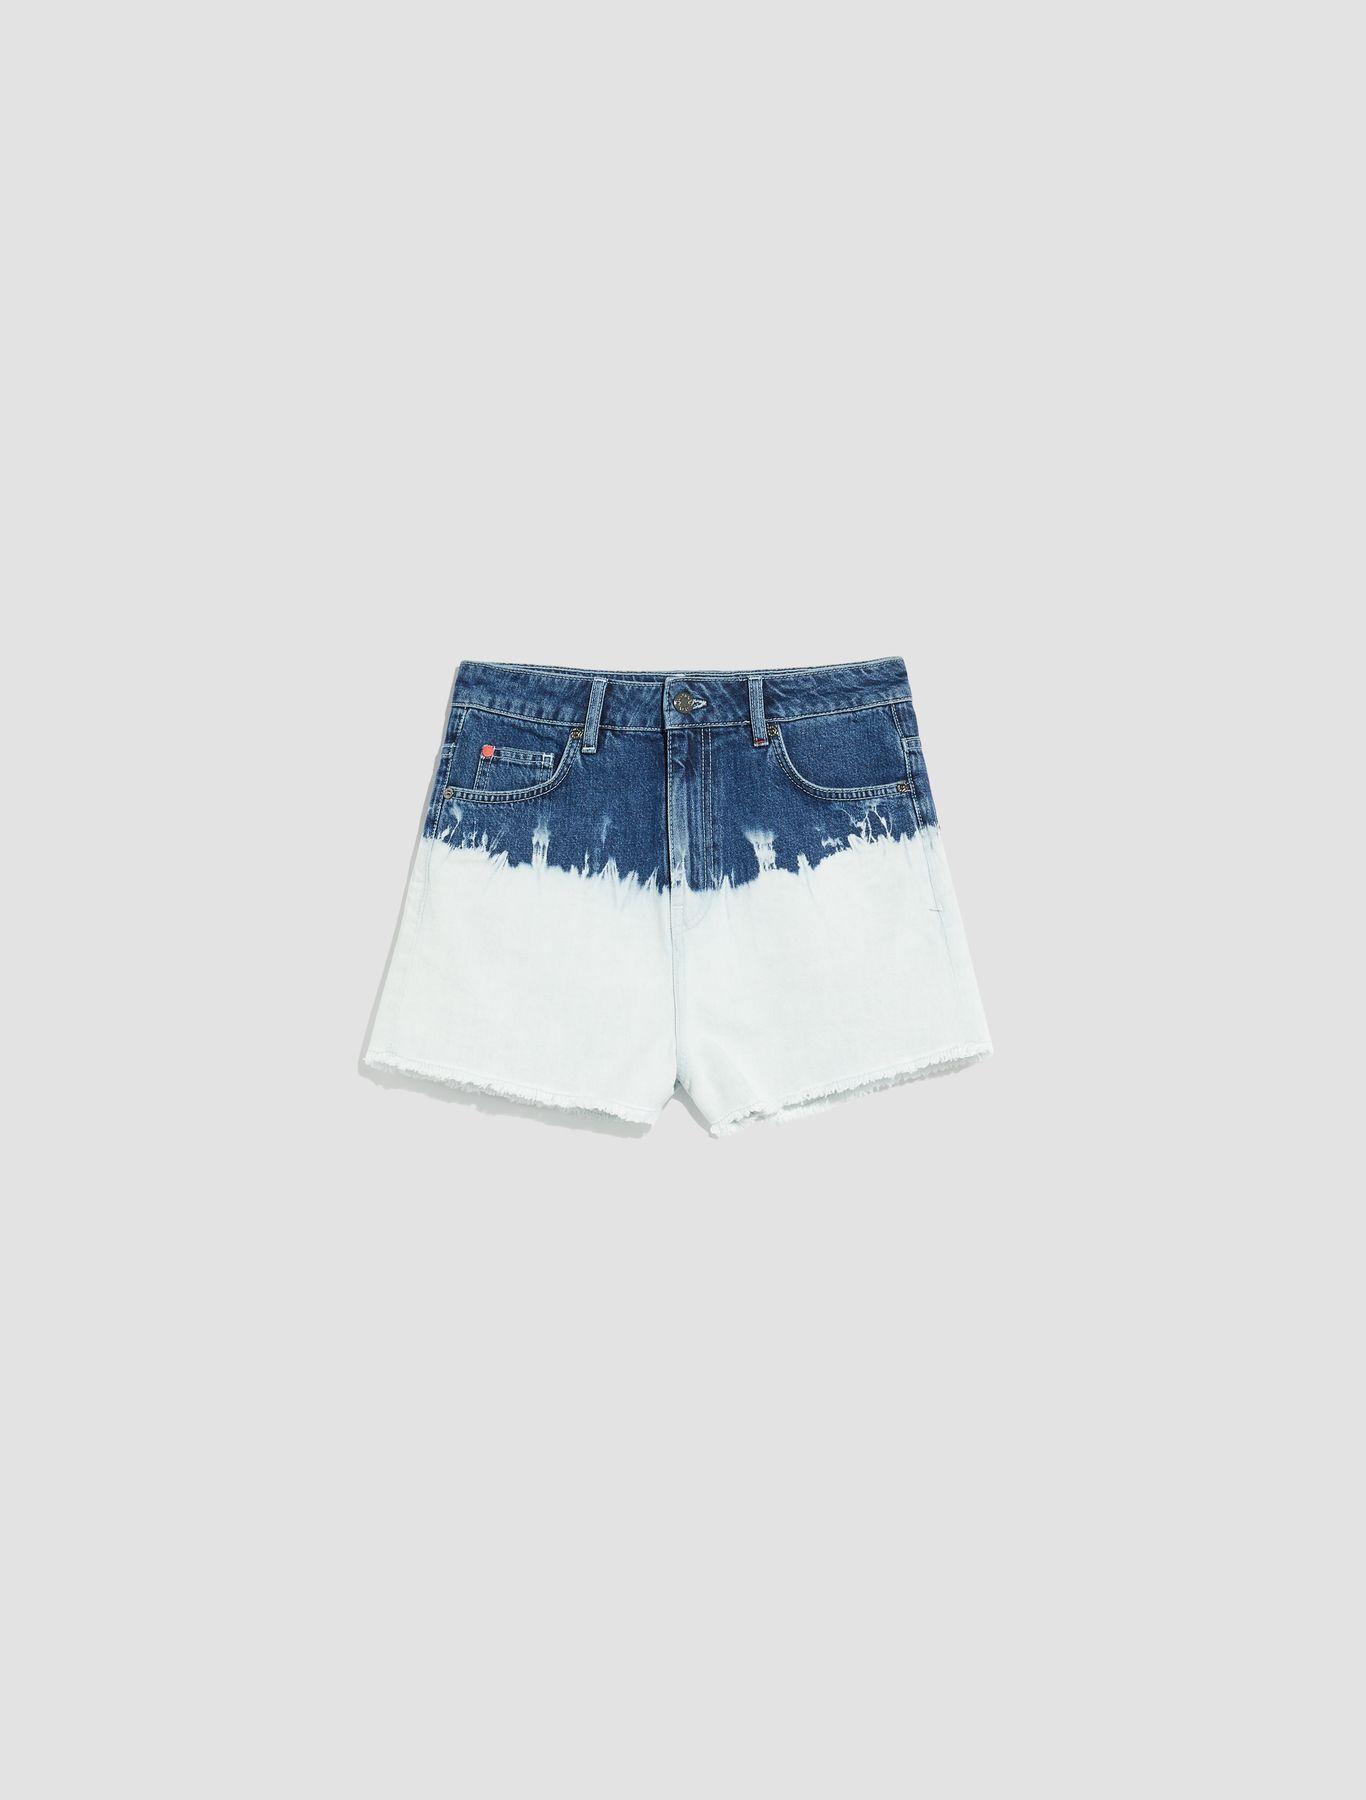 DORELLA Short trouser light blue pattern 5